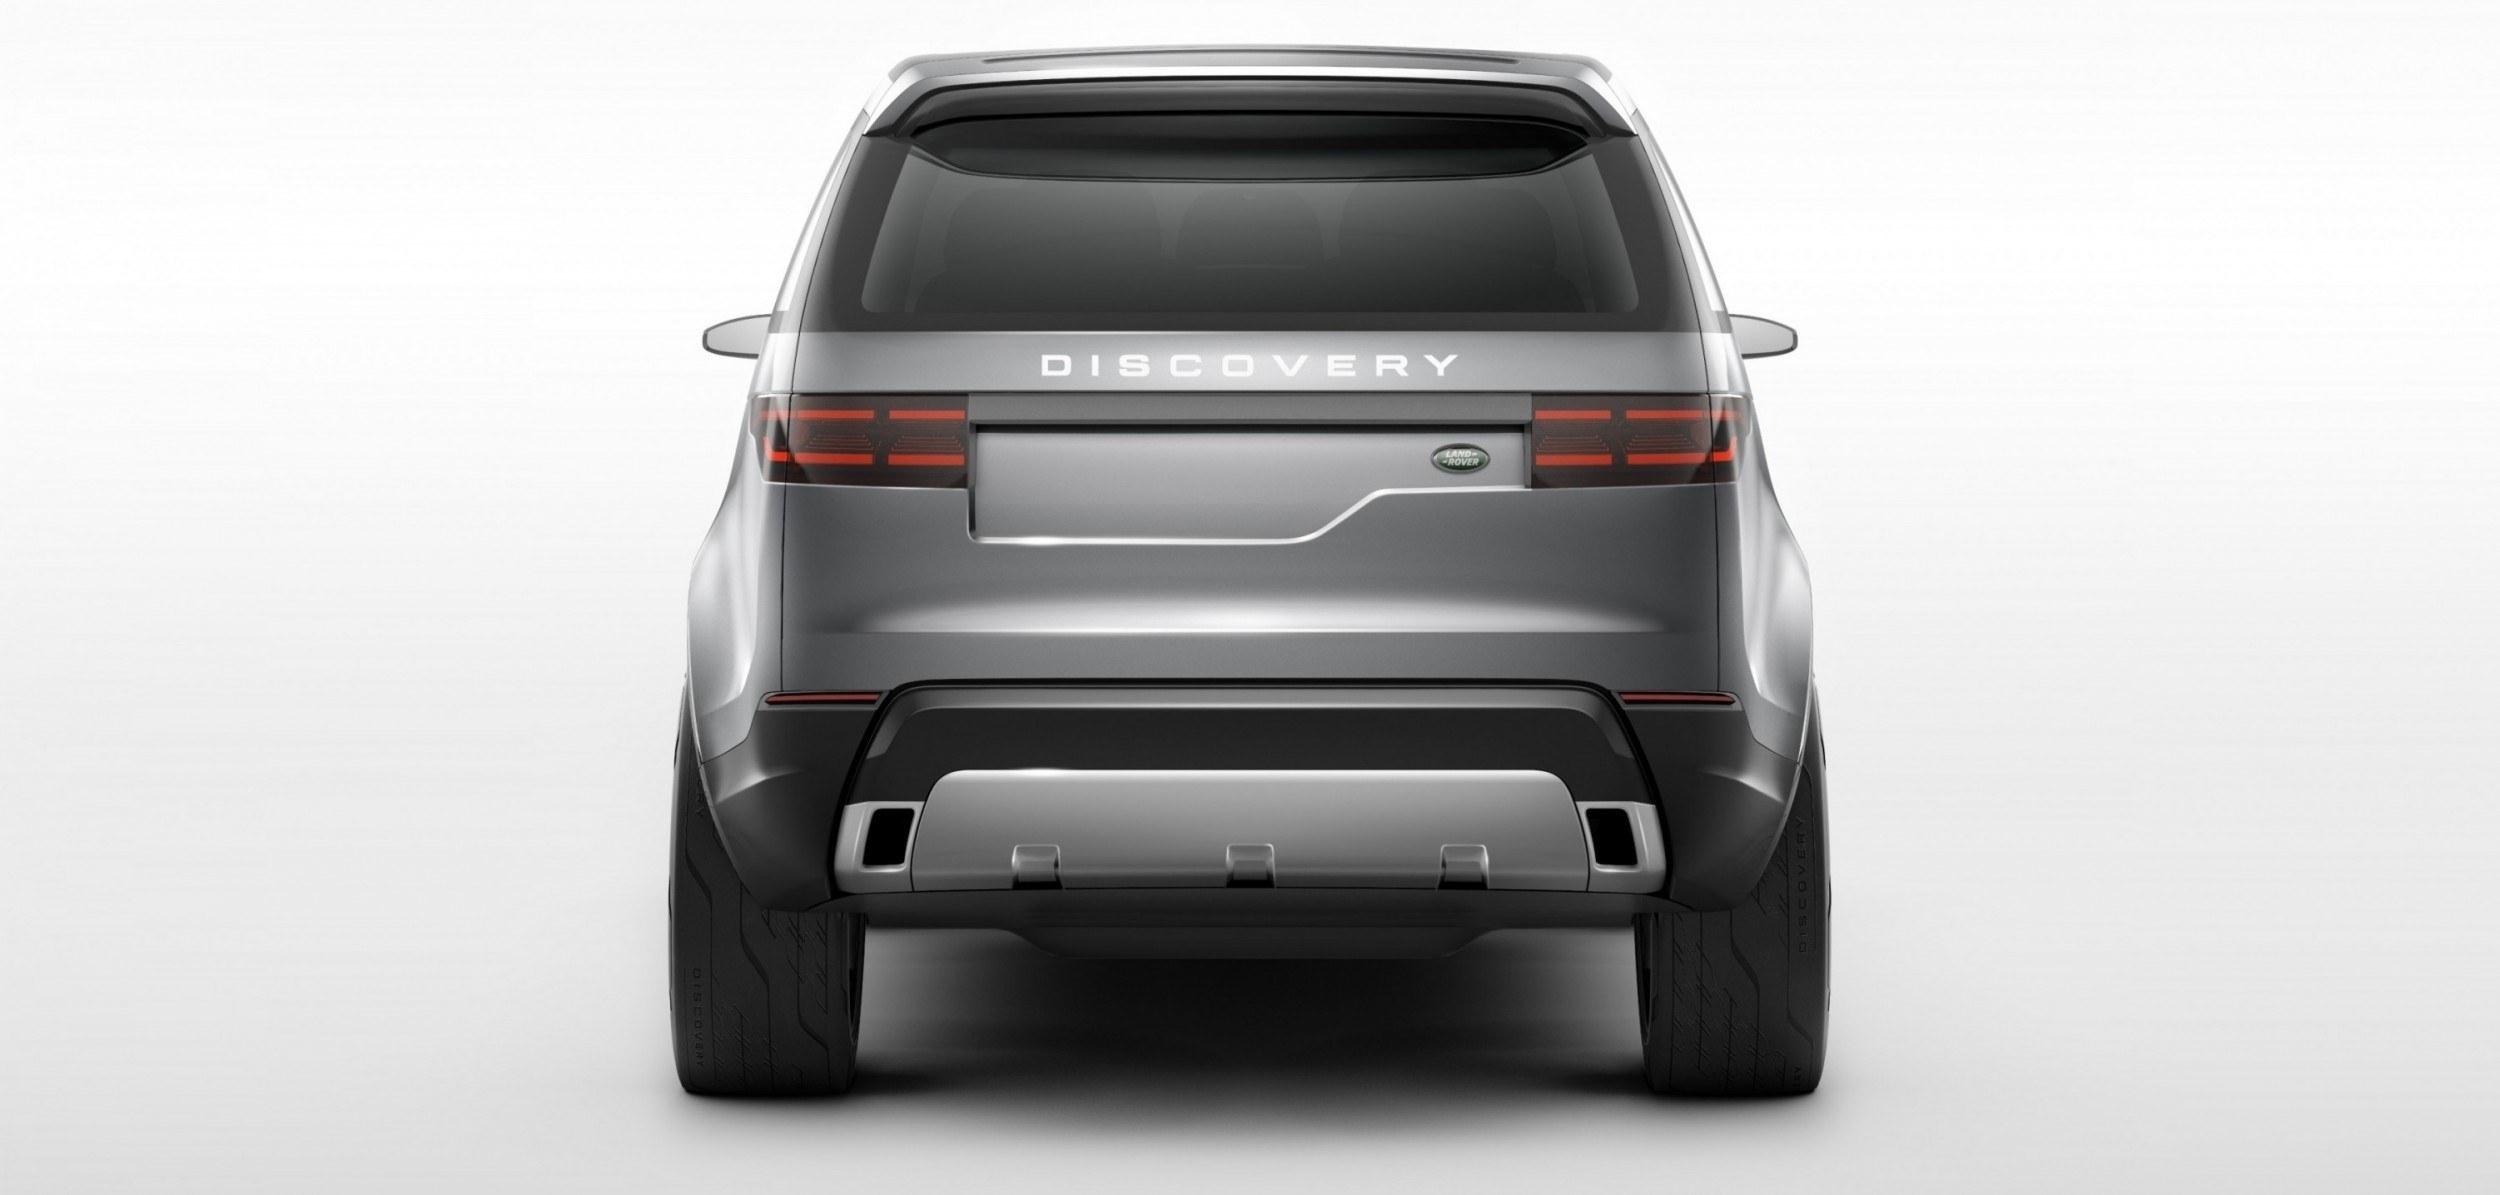 http://www.car-revs-daily.com/wp-content/uploads/2014/04/Discovery_Vision_Concept_6.jpg